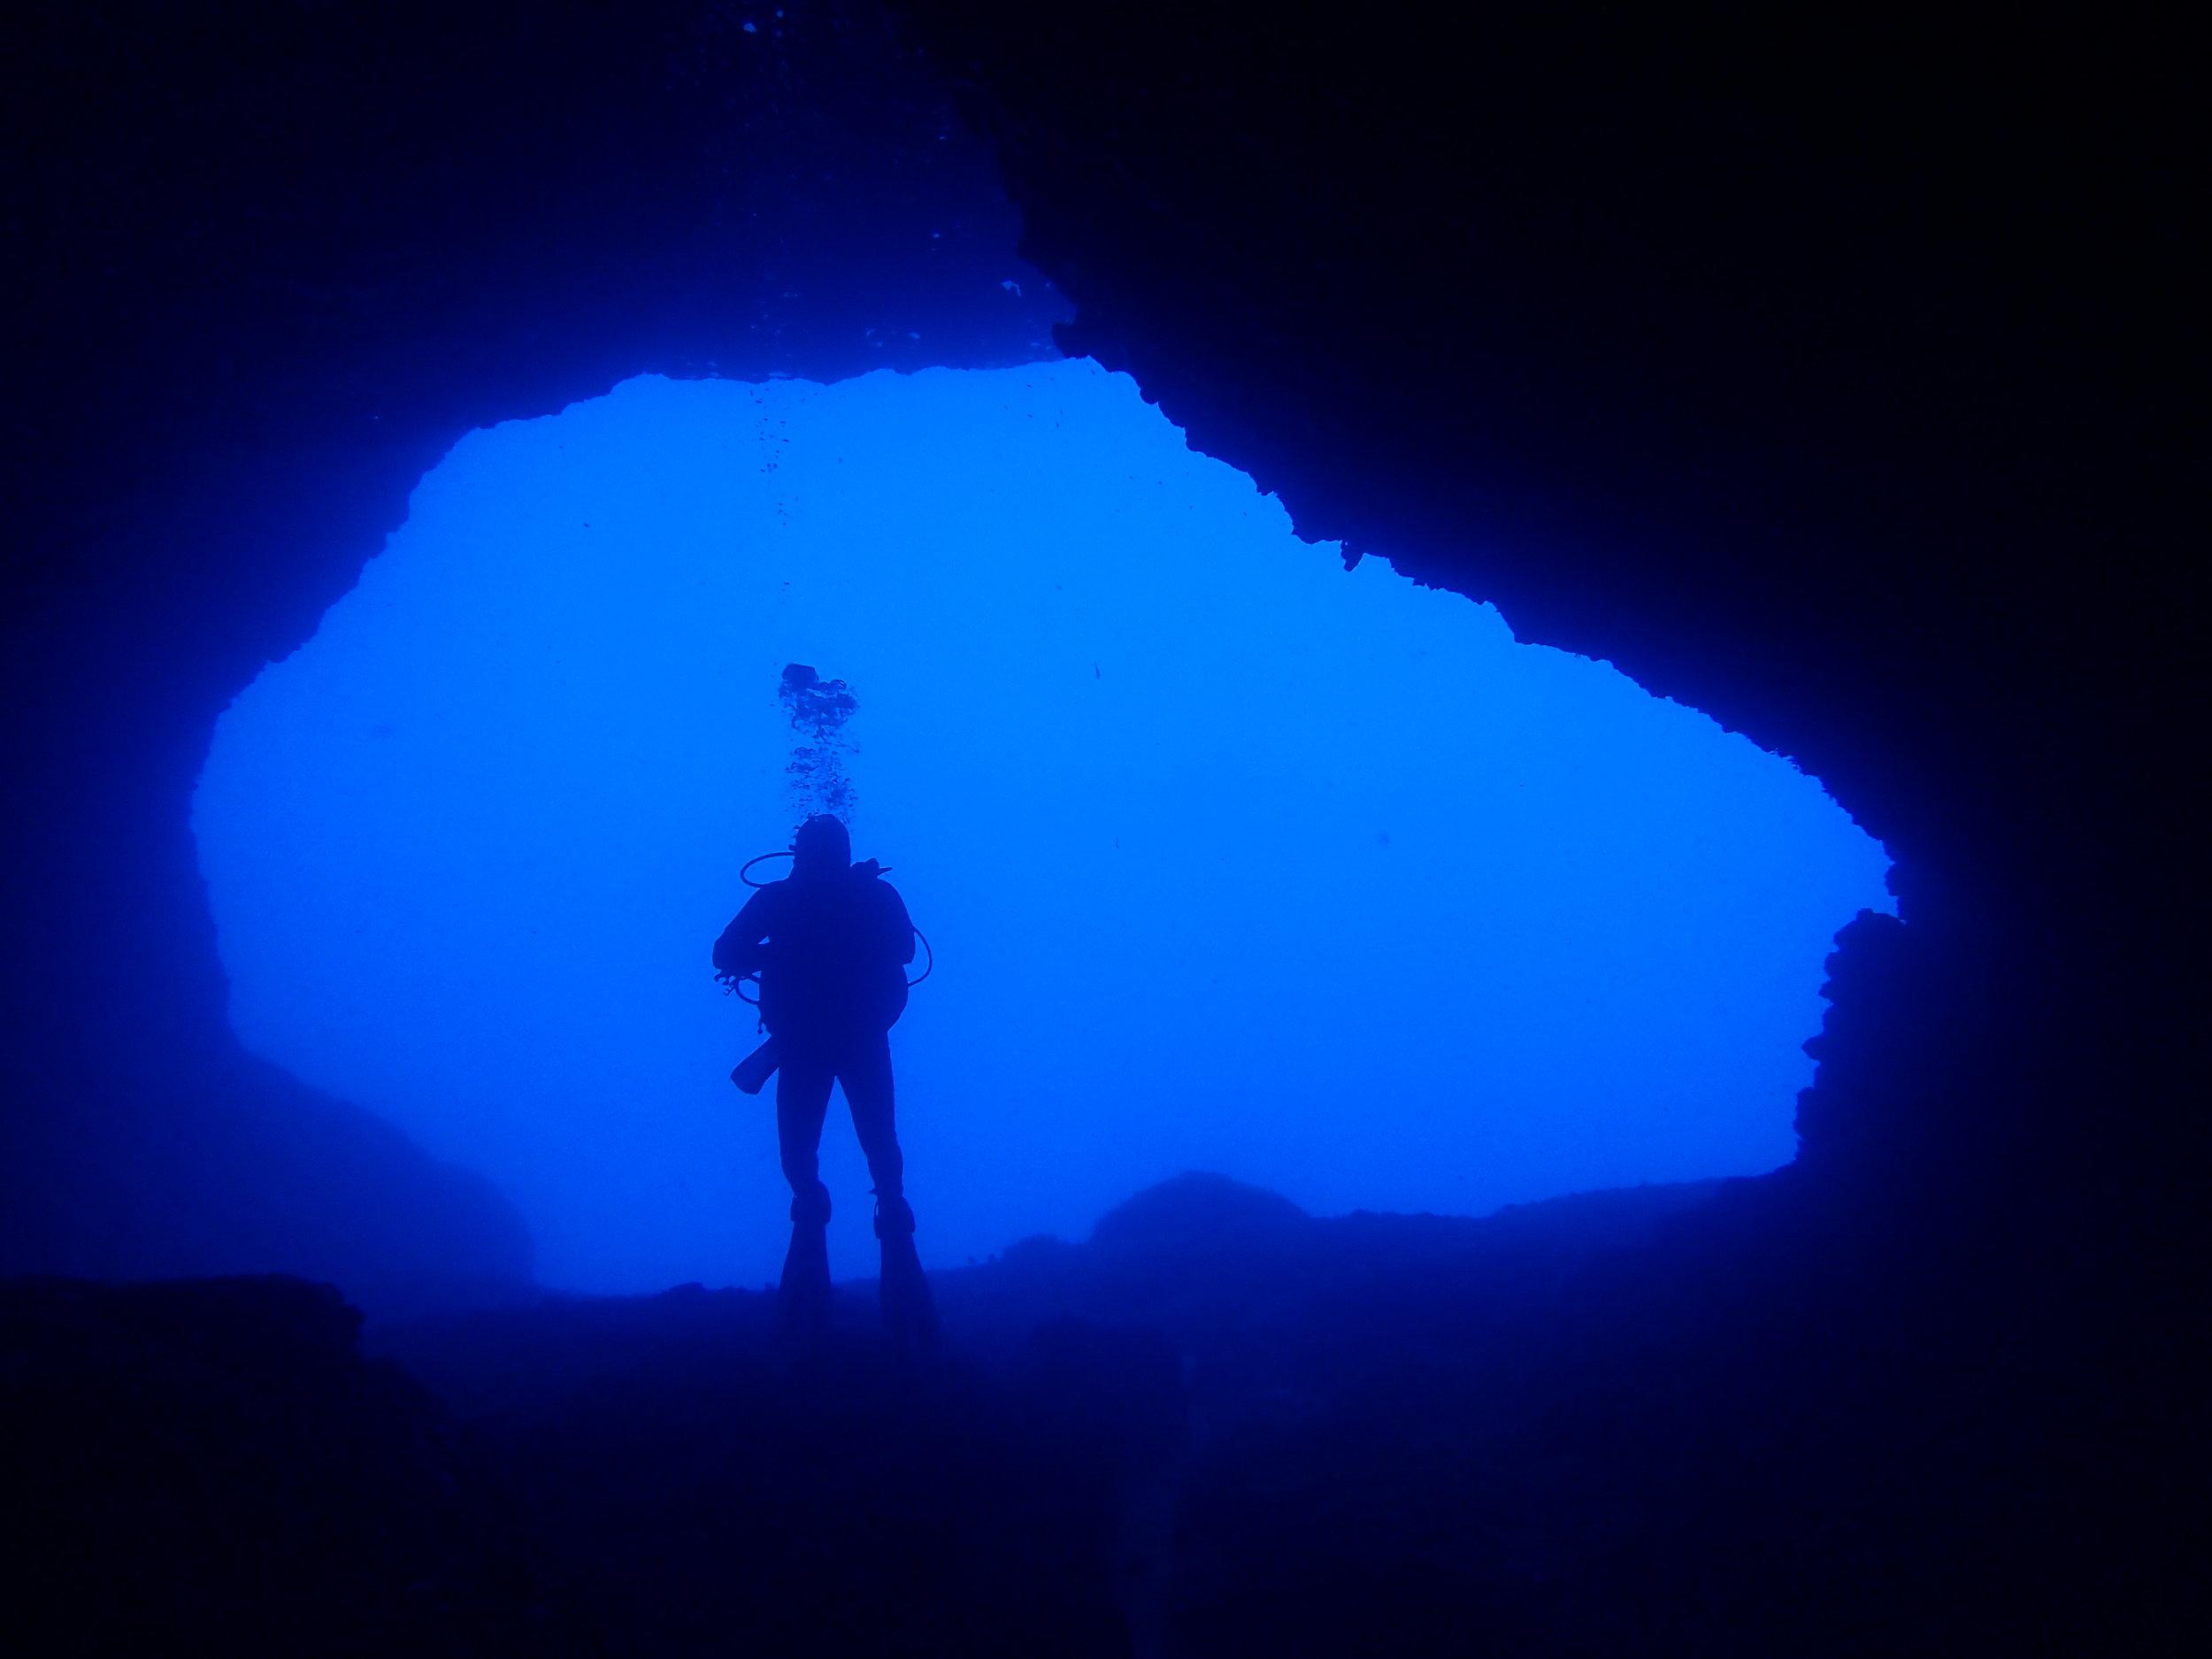 Elephant Cave & Environs, Crete - July 24, 2017